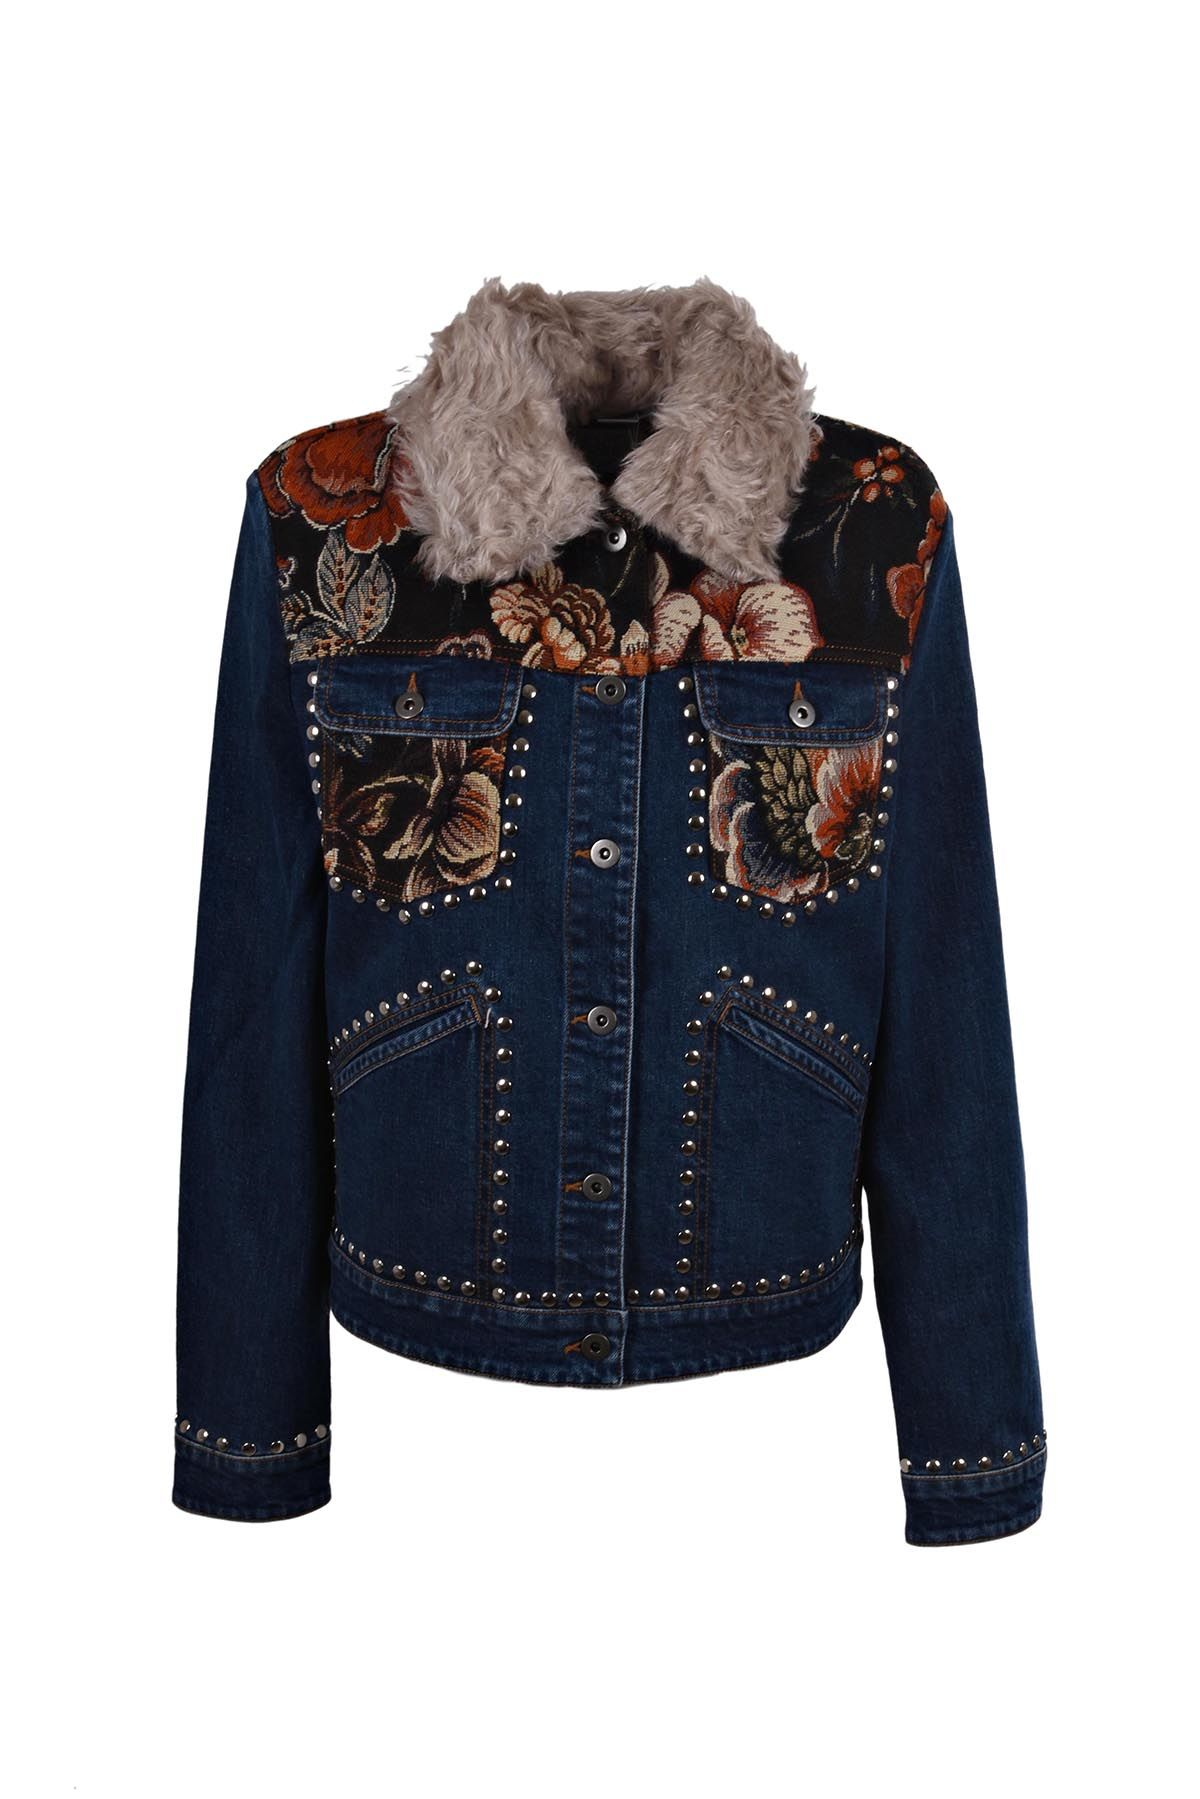 Stella McCartney Mccartney Nashville Denim Jacket